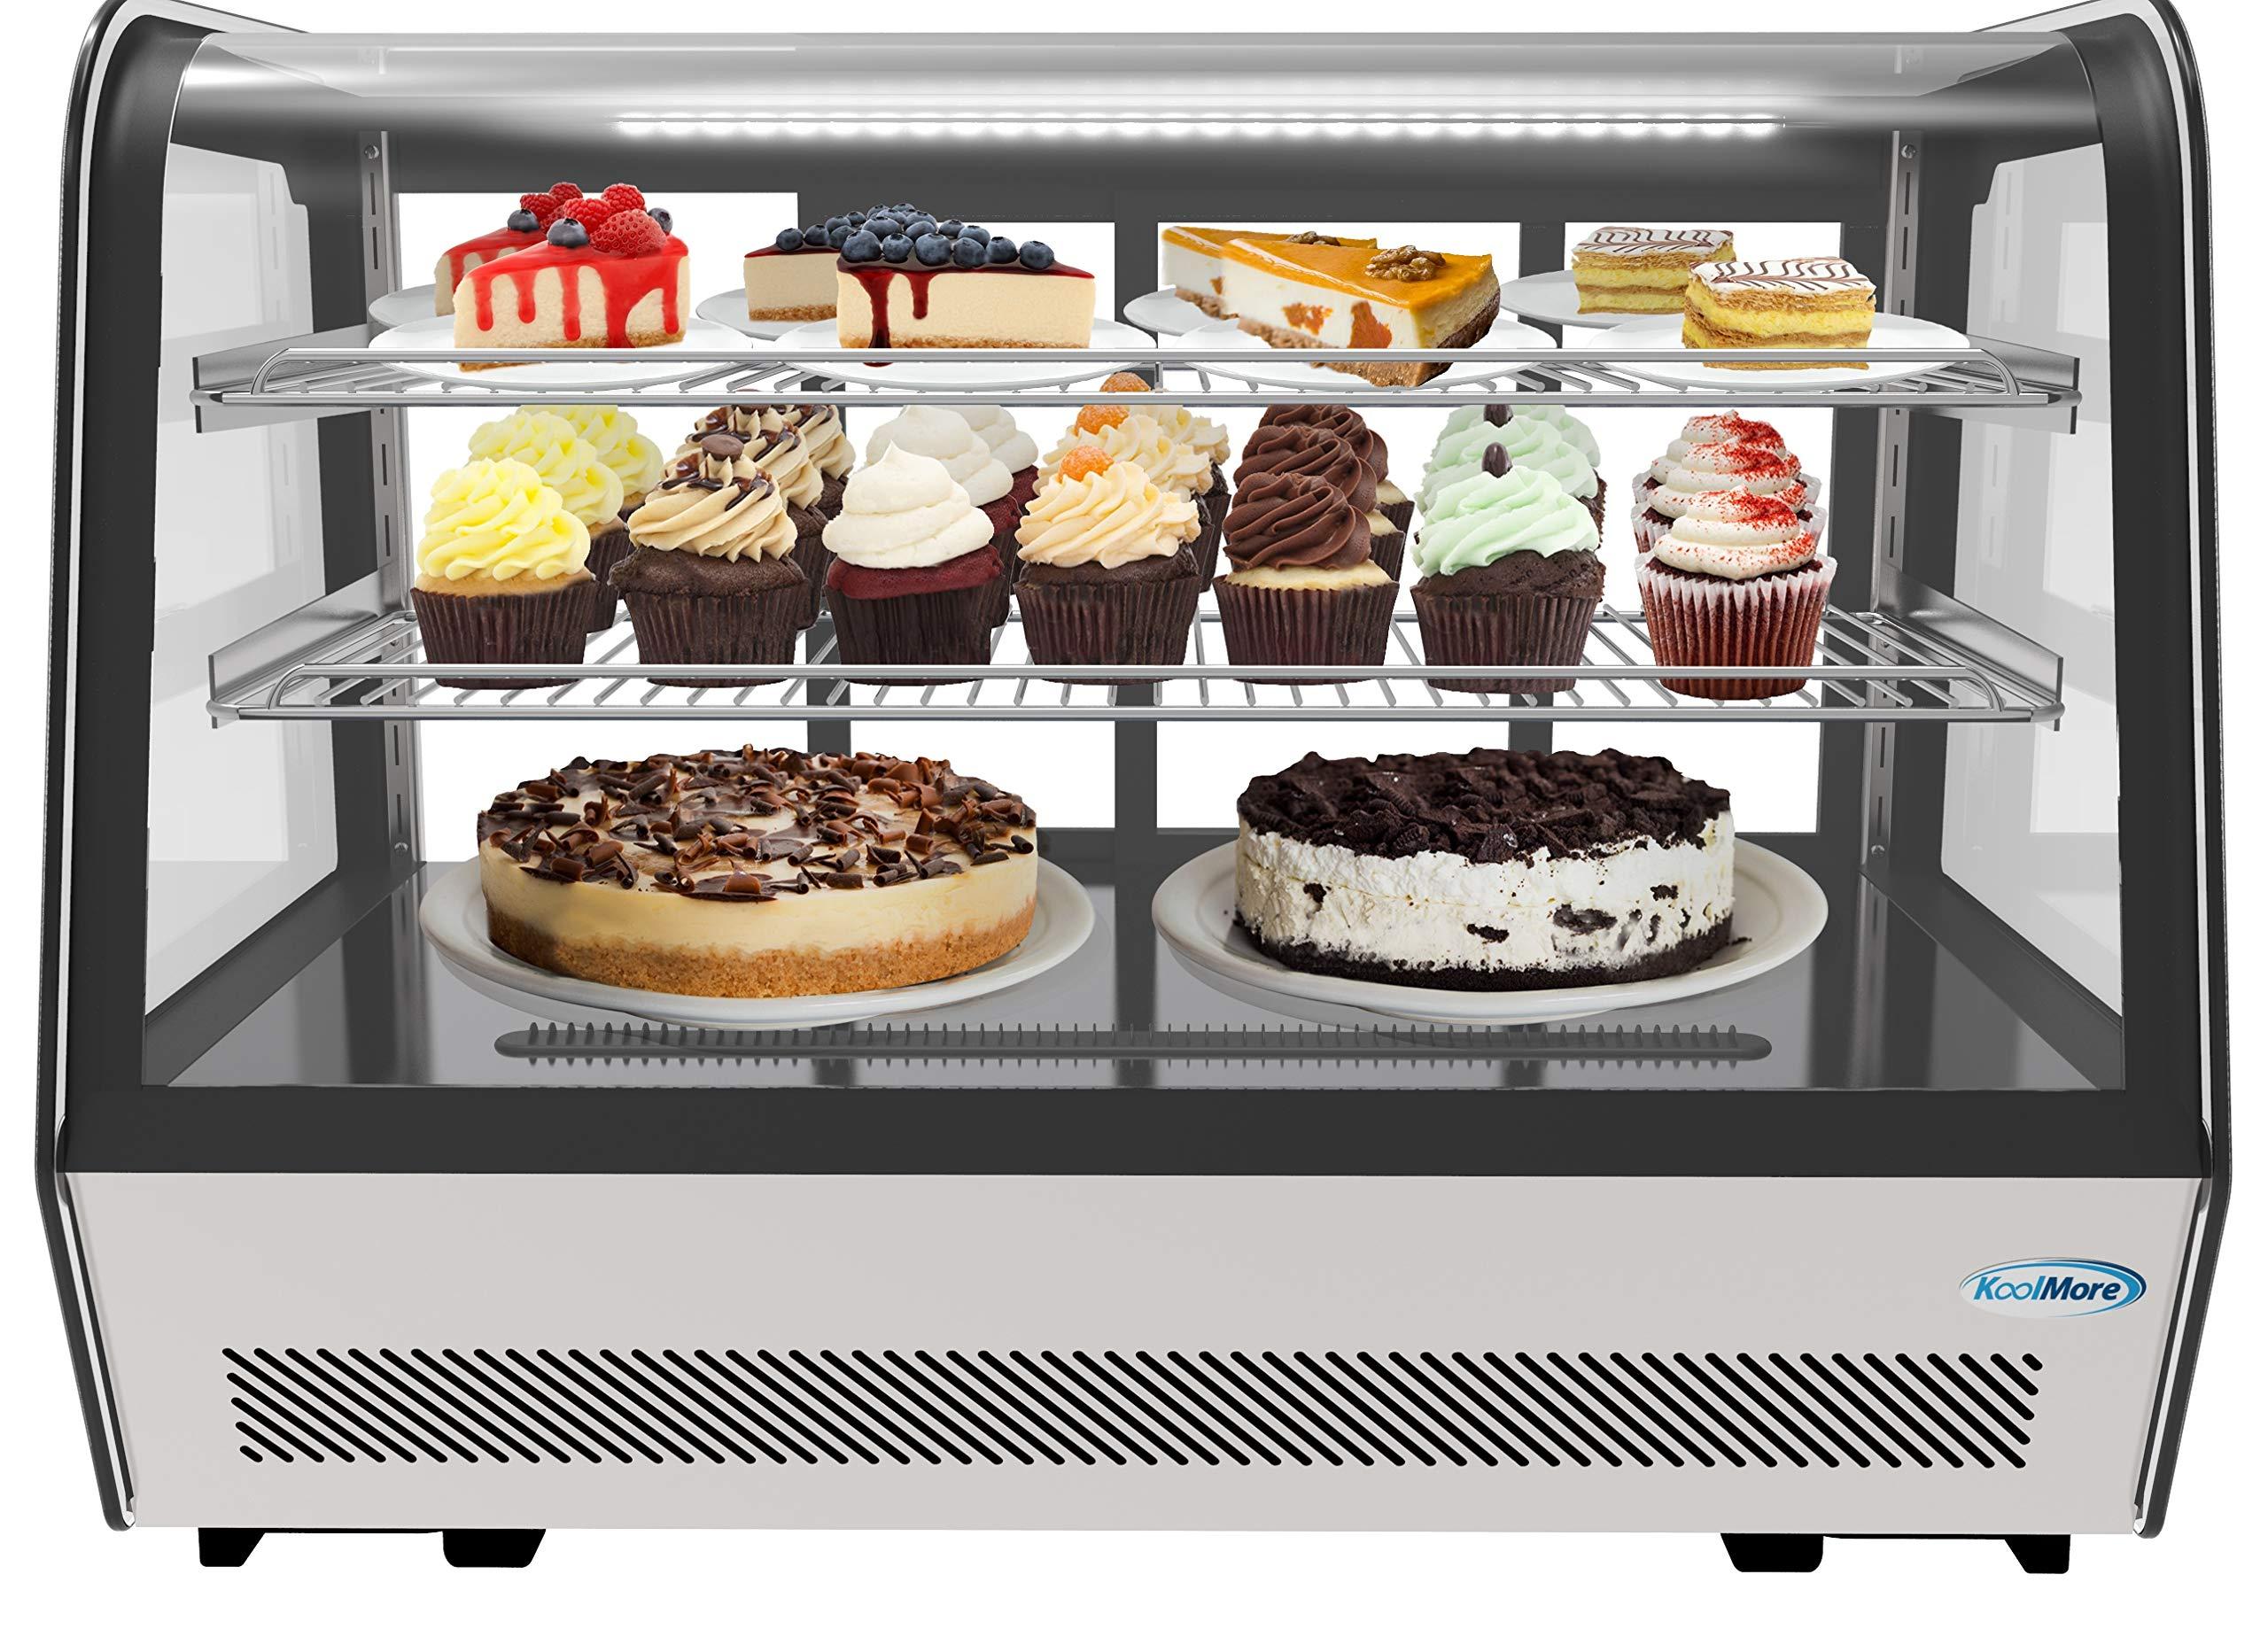 KoolMore 35'' Commercial Countertop Refrigerator Display Case Merchandiser with LED Lighting - 5.6 cu. ft